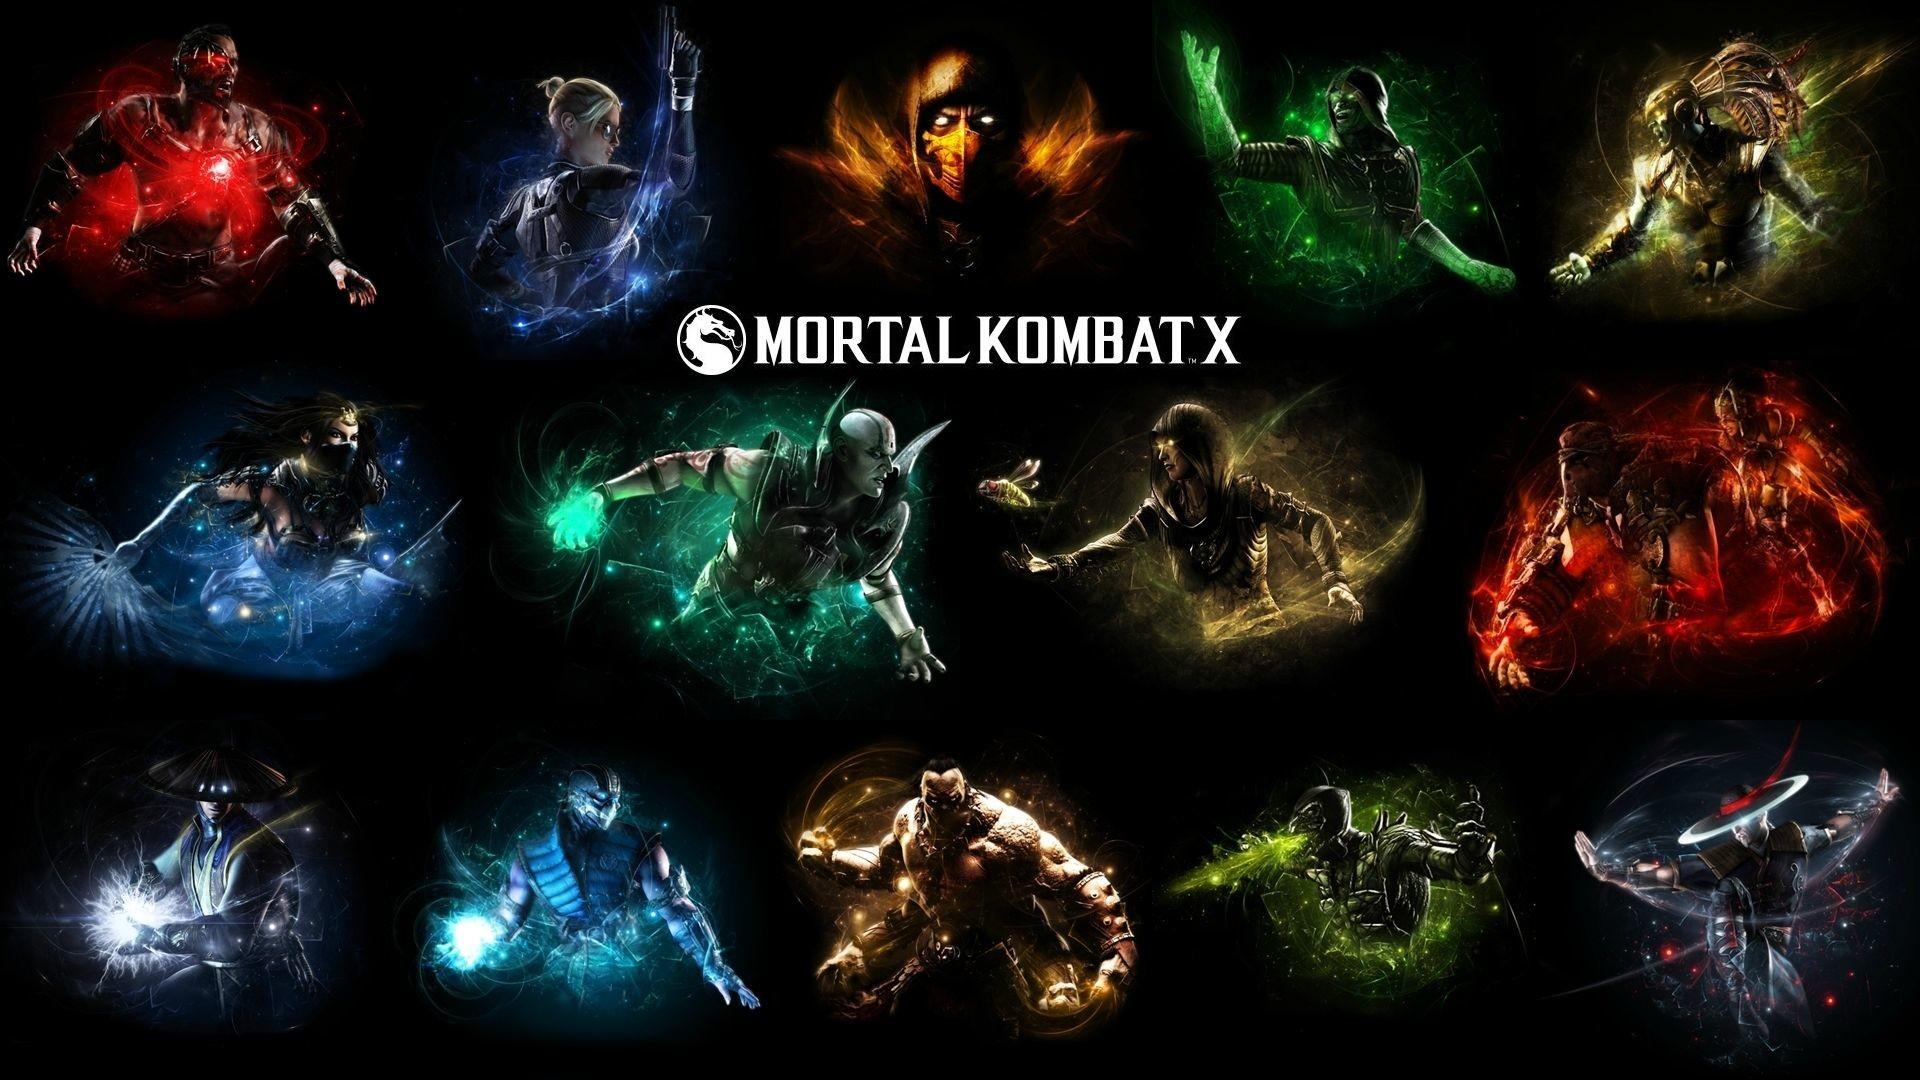 Gorgeous Mortal Kombat X Wallpaper | Full HD Pictures